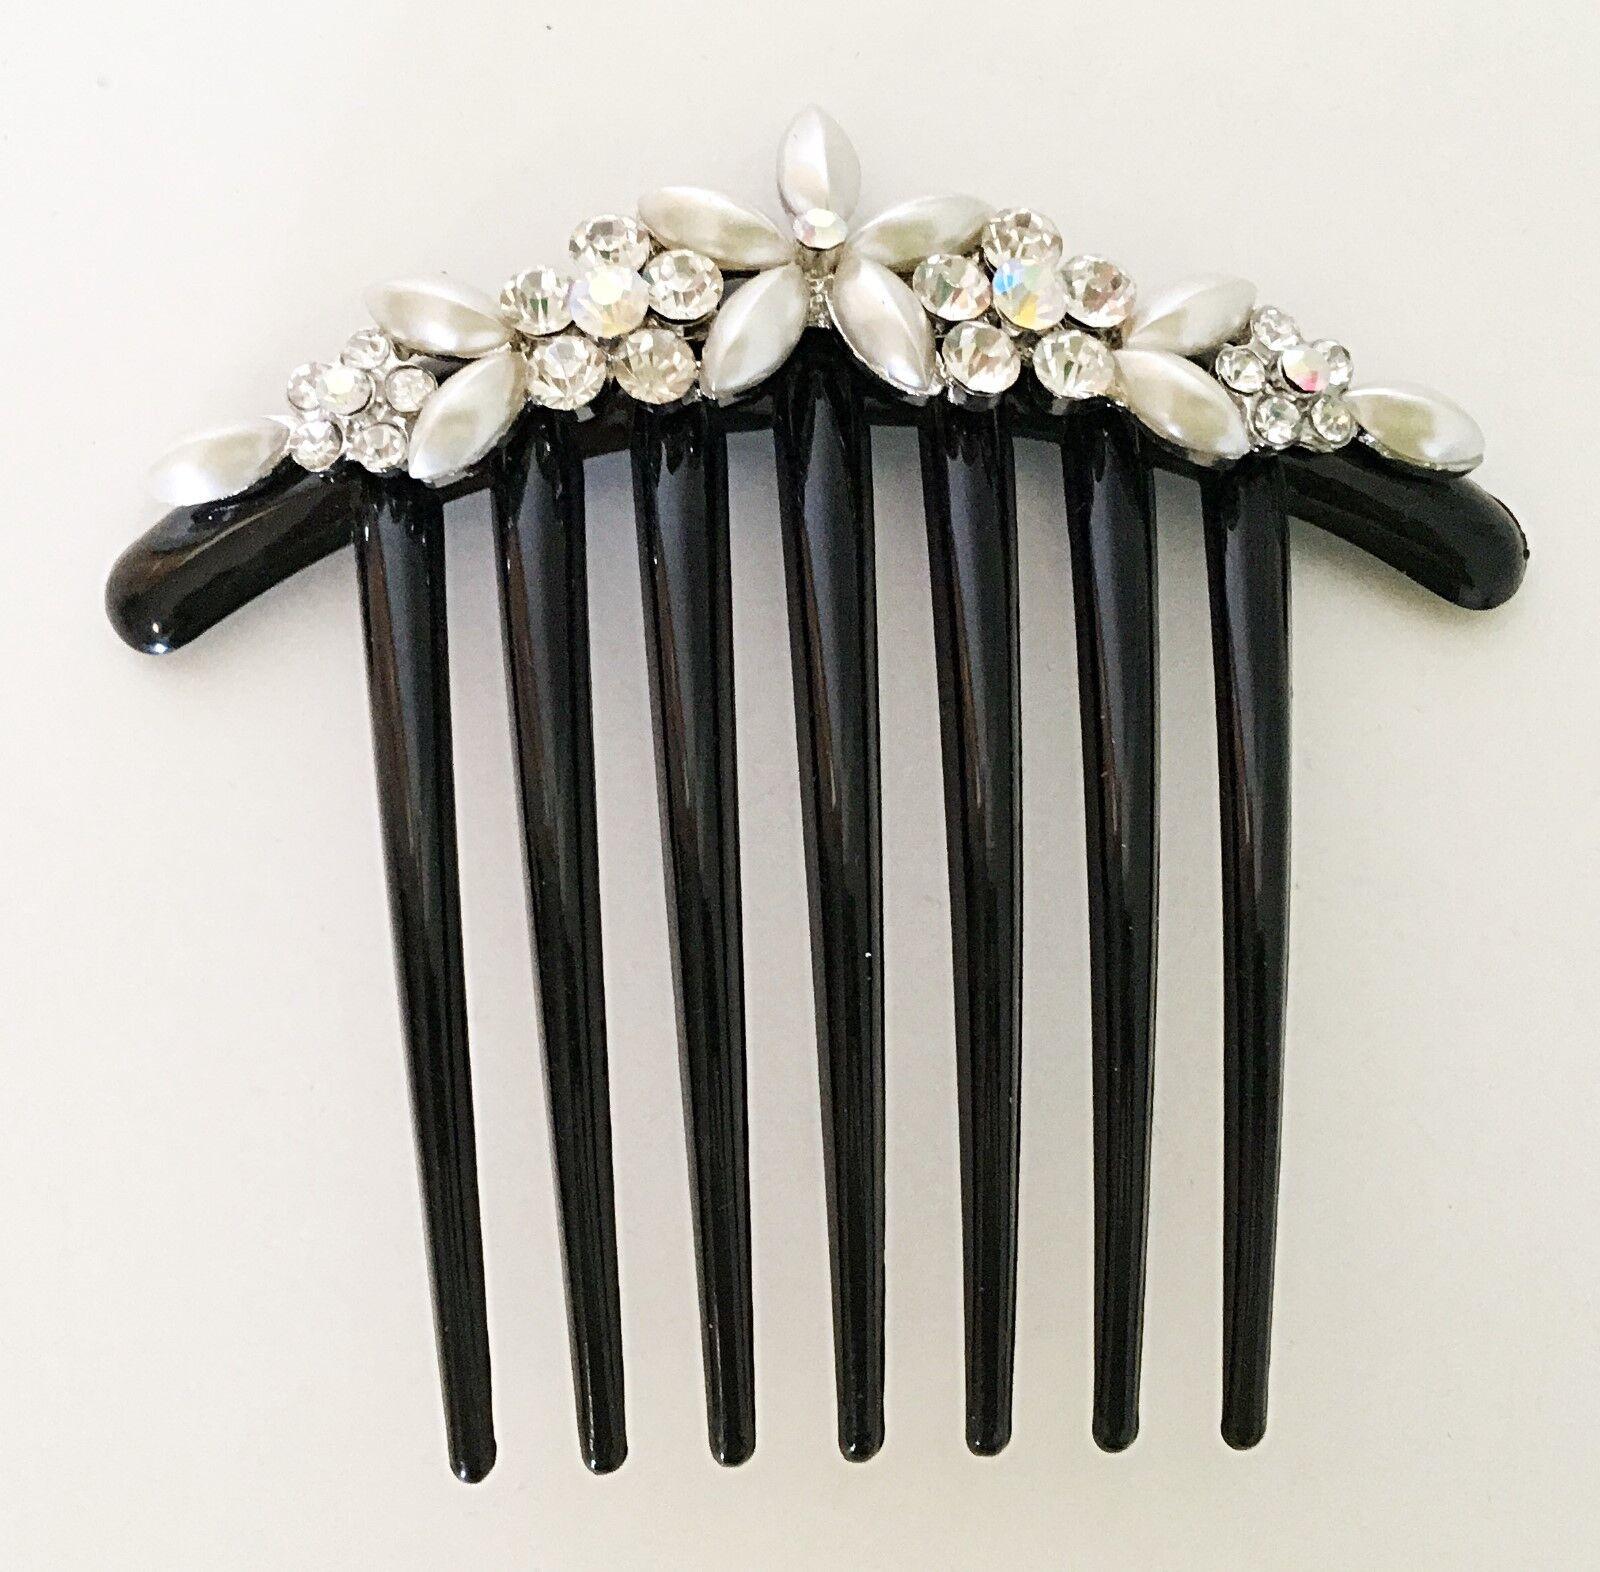 acrylic bridal hair comb crafted imitation pearl